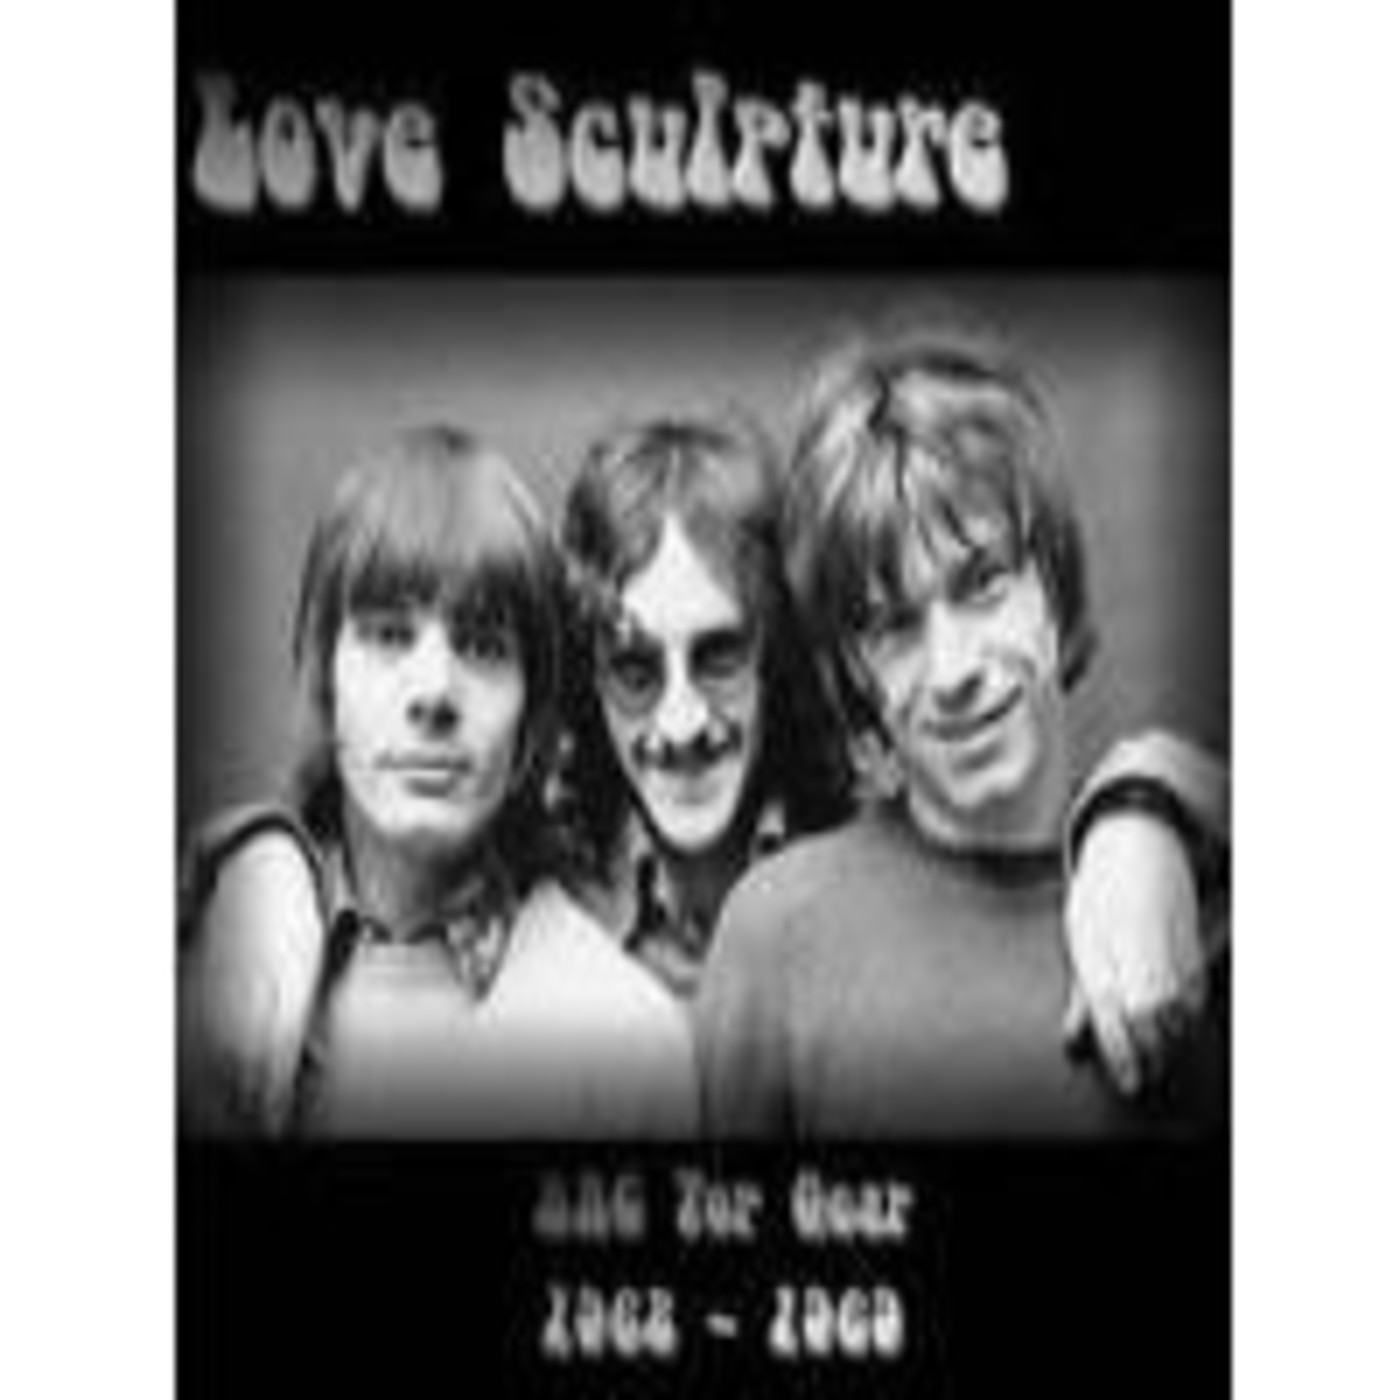 Love Sculpture - Sabre Dance (1968)